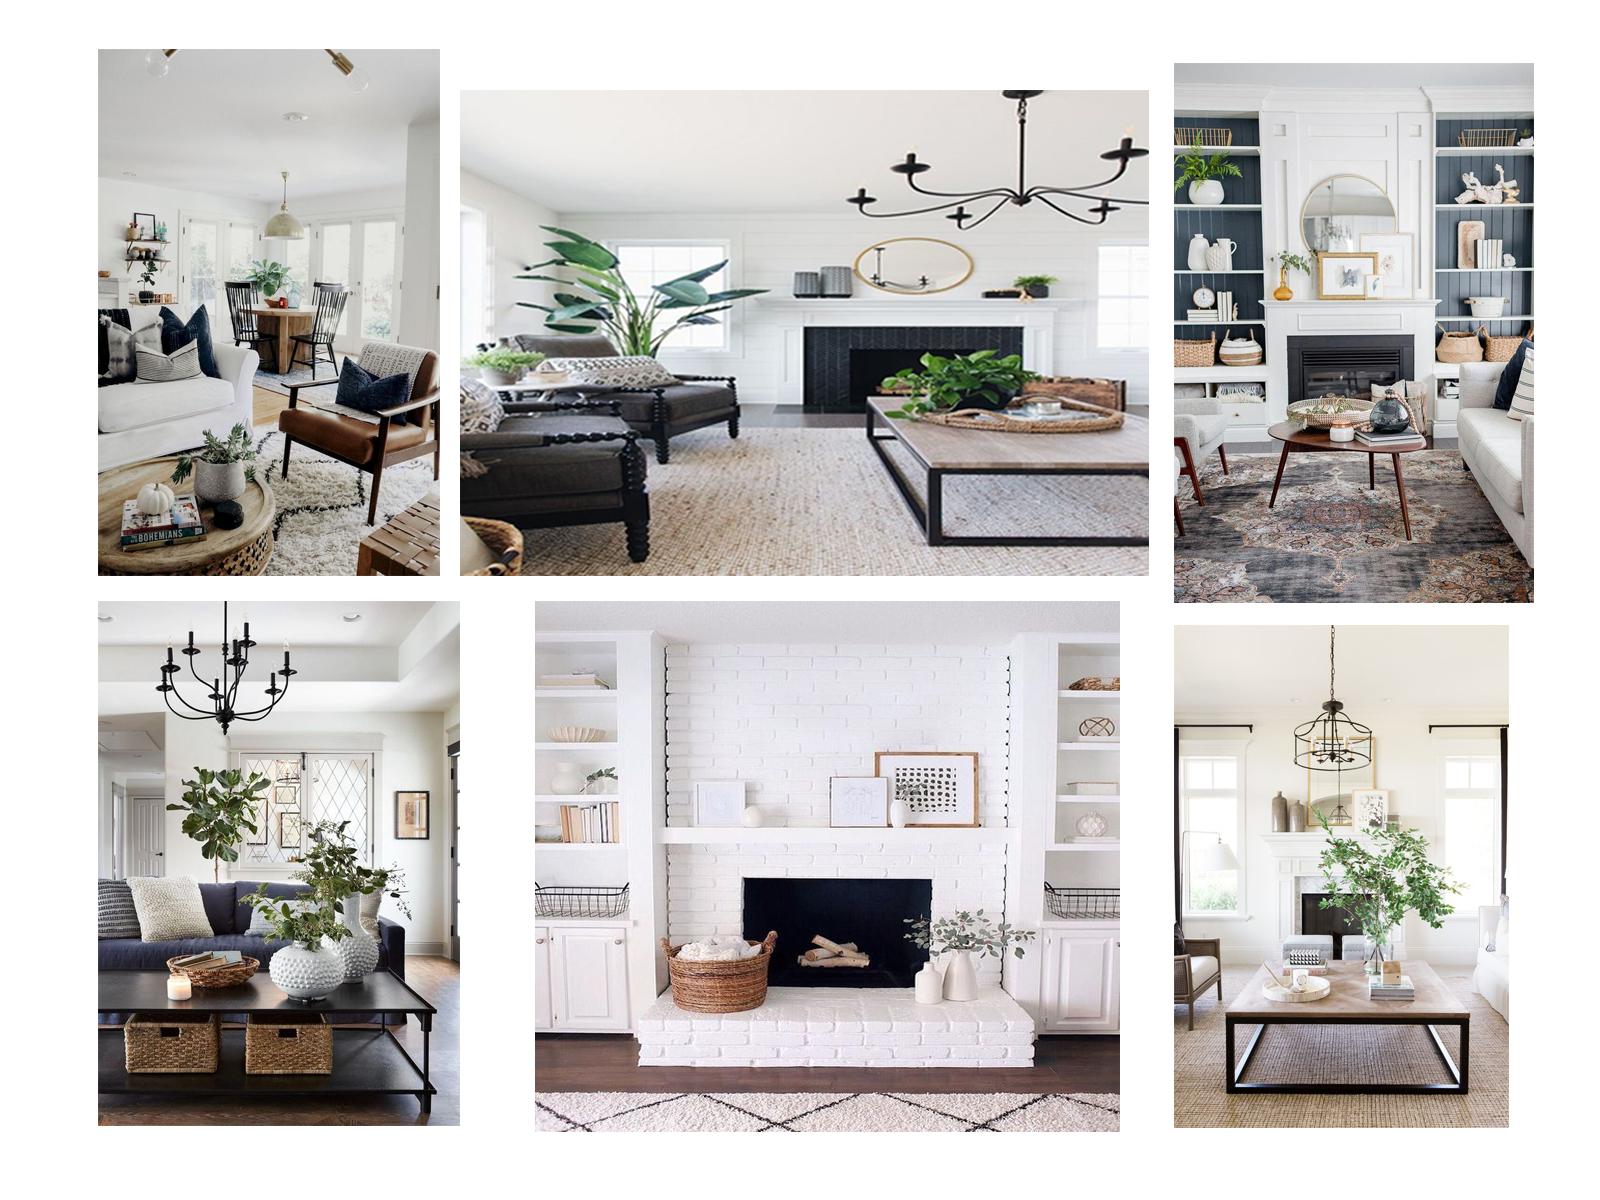 Kristen Living Room Inspiration.png